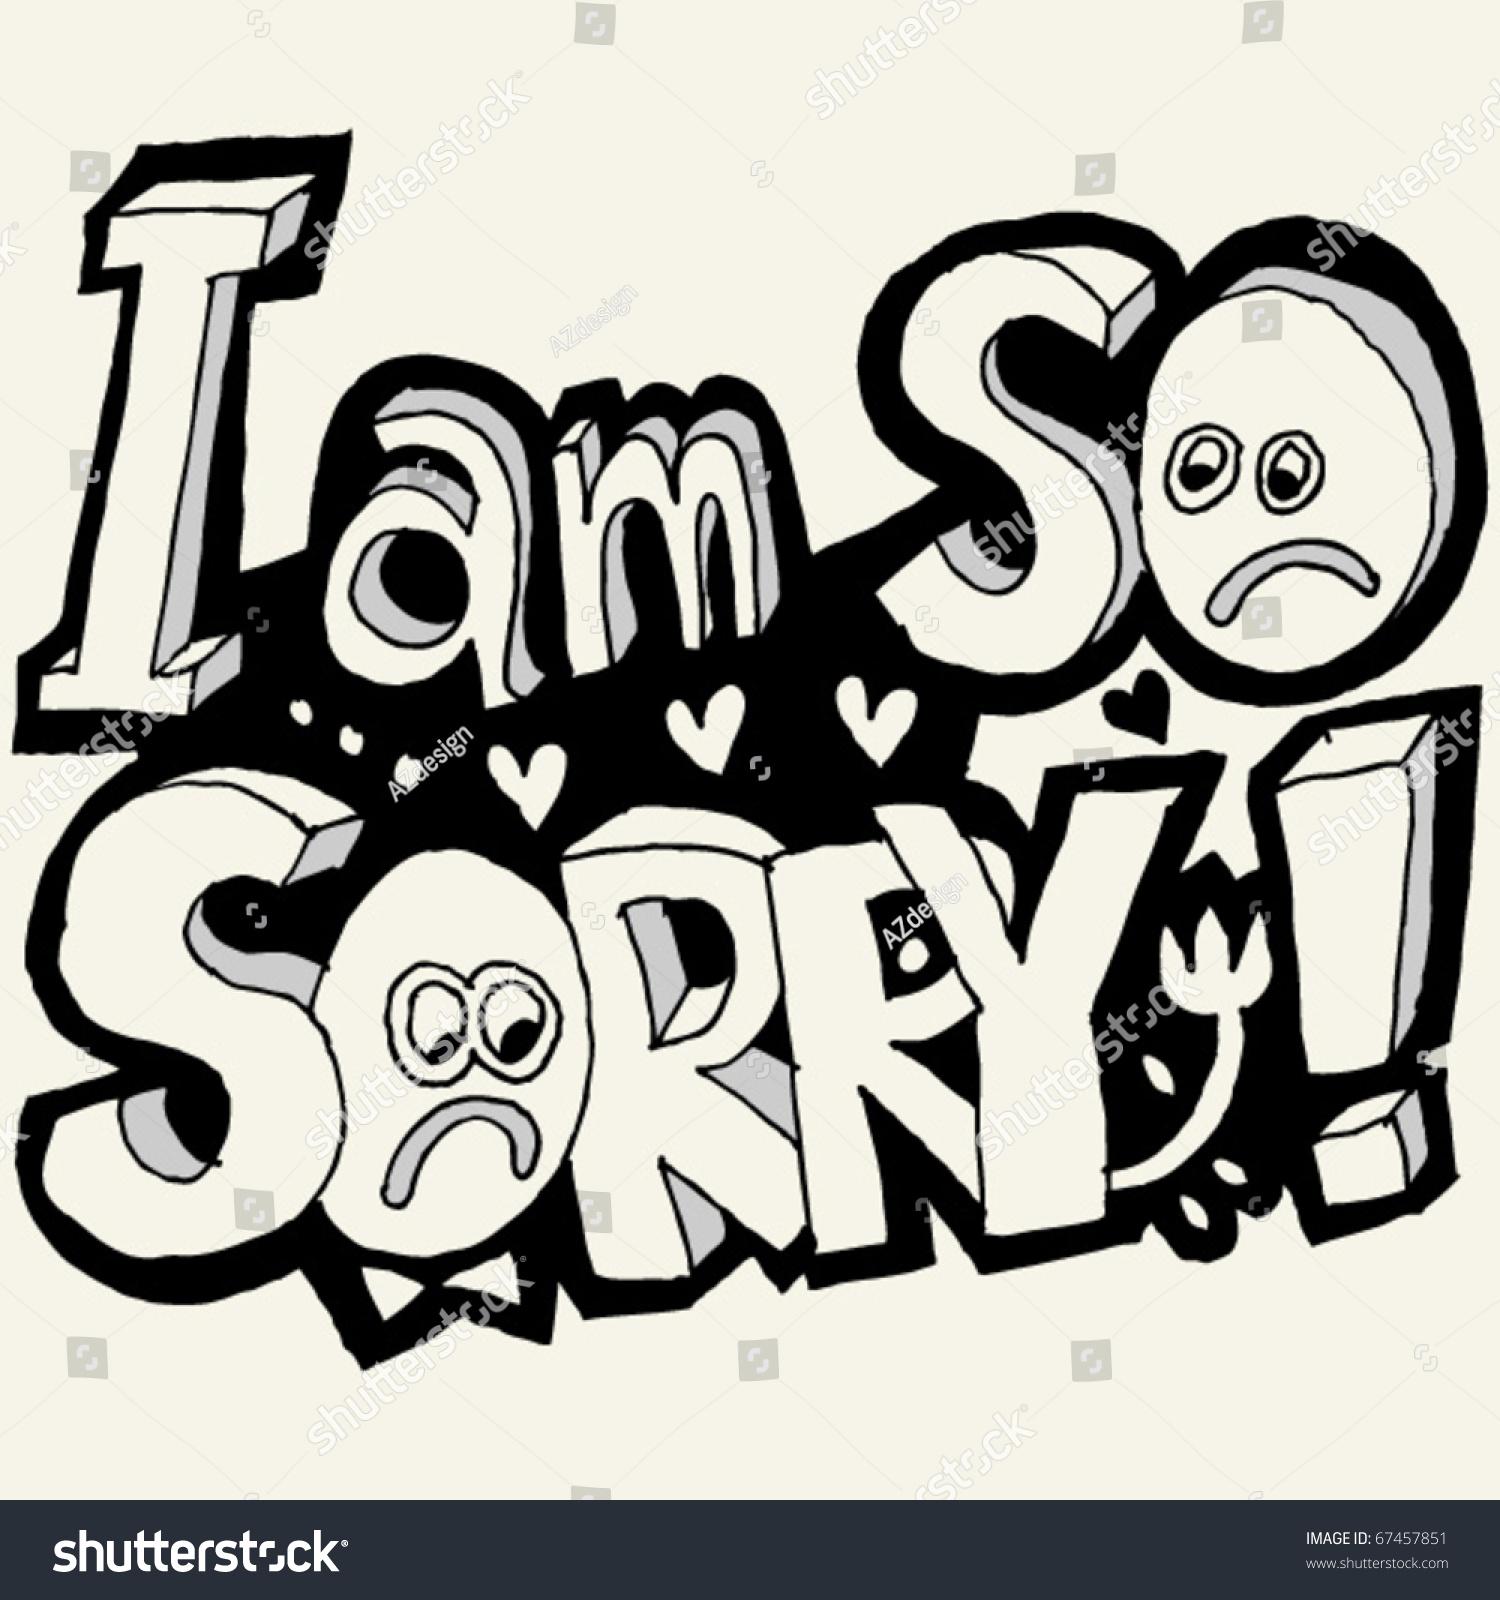 I Am So Sorry Doodle Lettering Stock Photo 67457851 Avopixcom